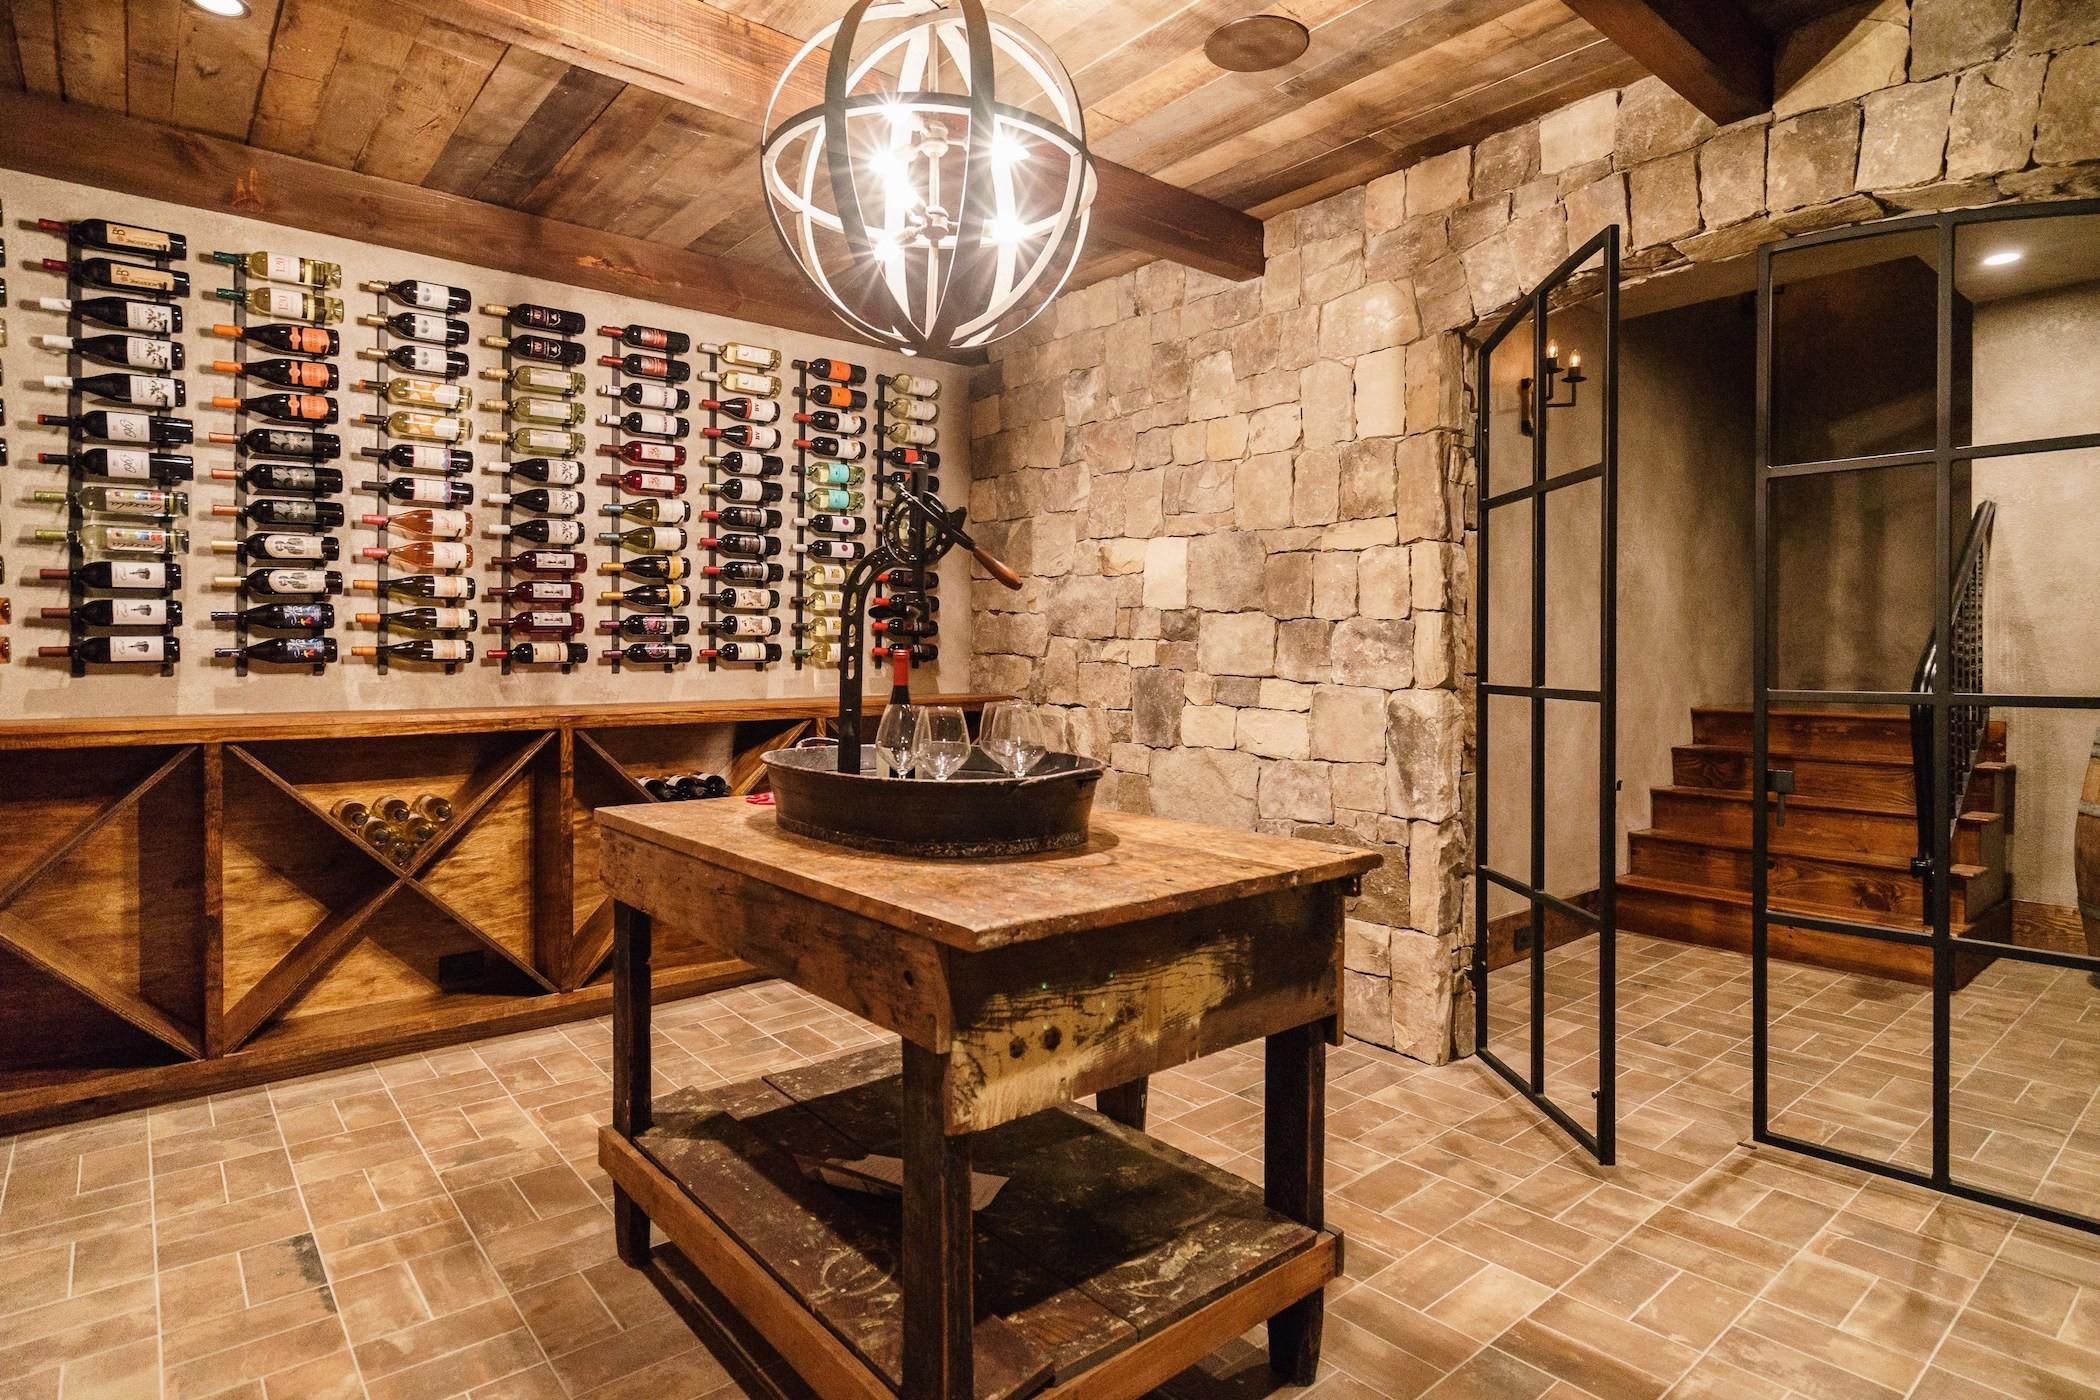 034_Wine_Cellar20170522103038